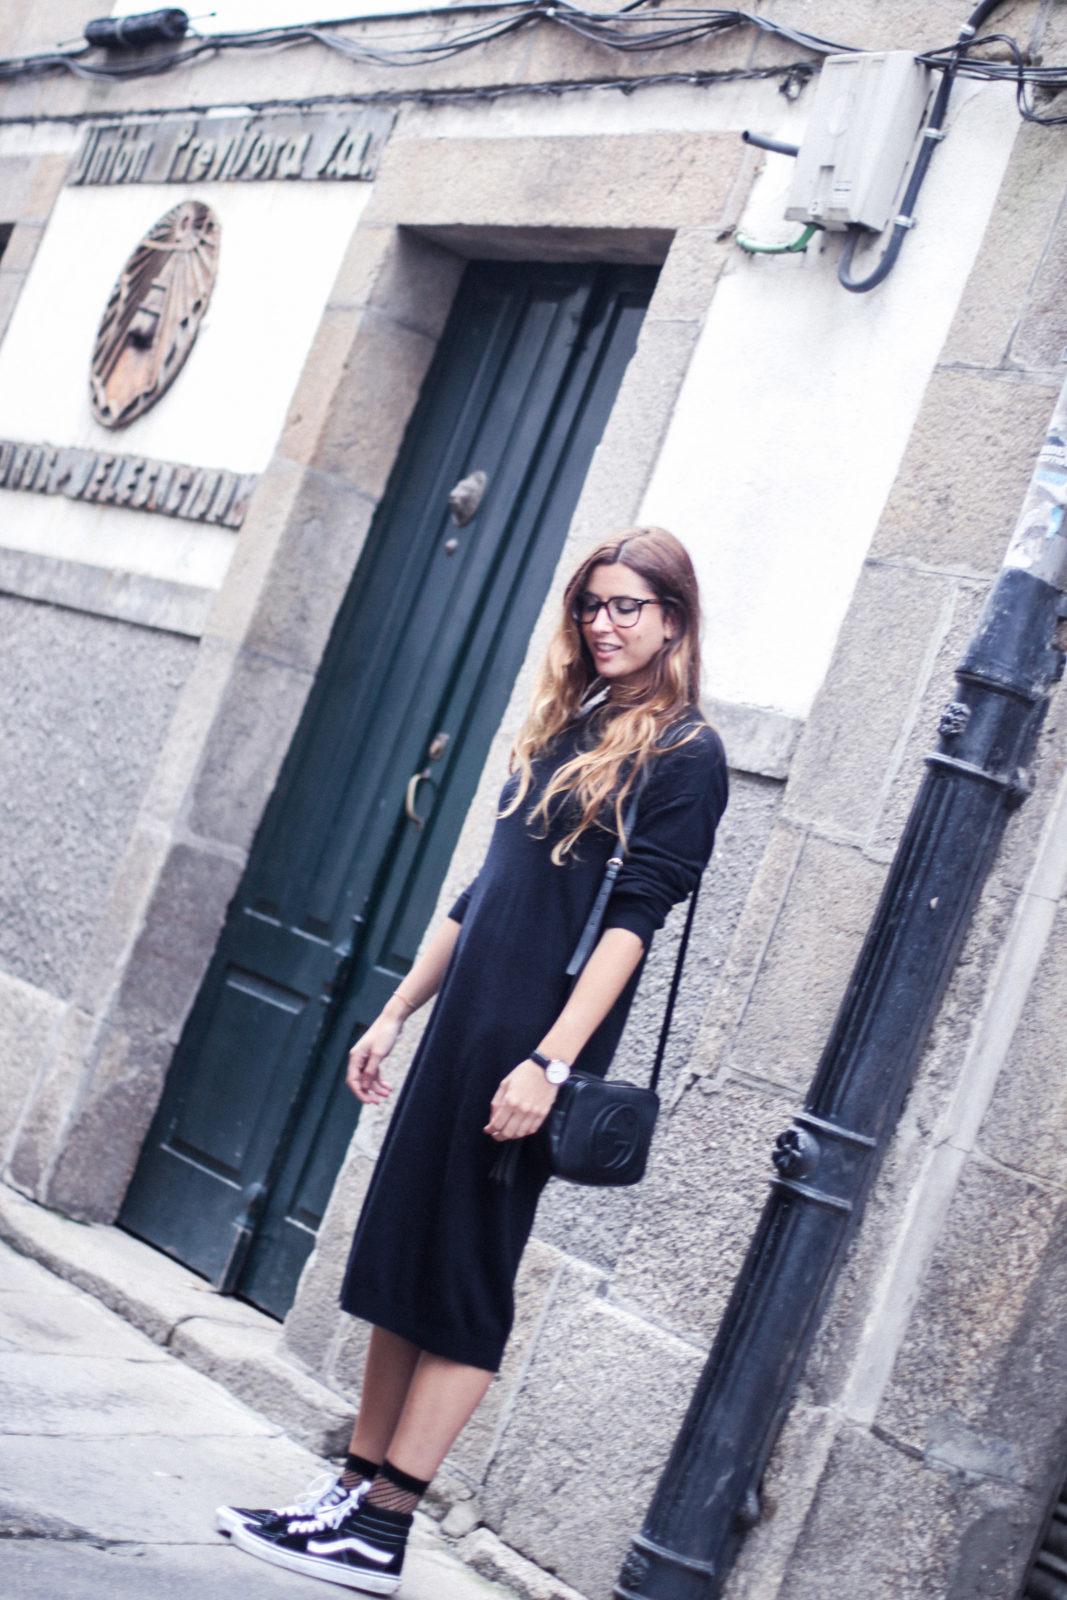 vestido_de_punto_midi_vans_calcetines_rejilla_choker_metalico_happiness_boutique_abrigo_largo_gucci_street_style_fall_2016_donkeycool-43